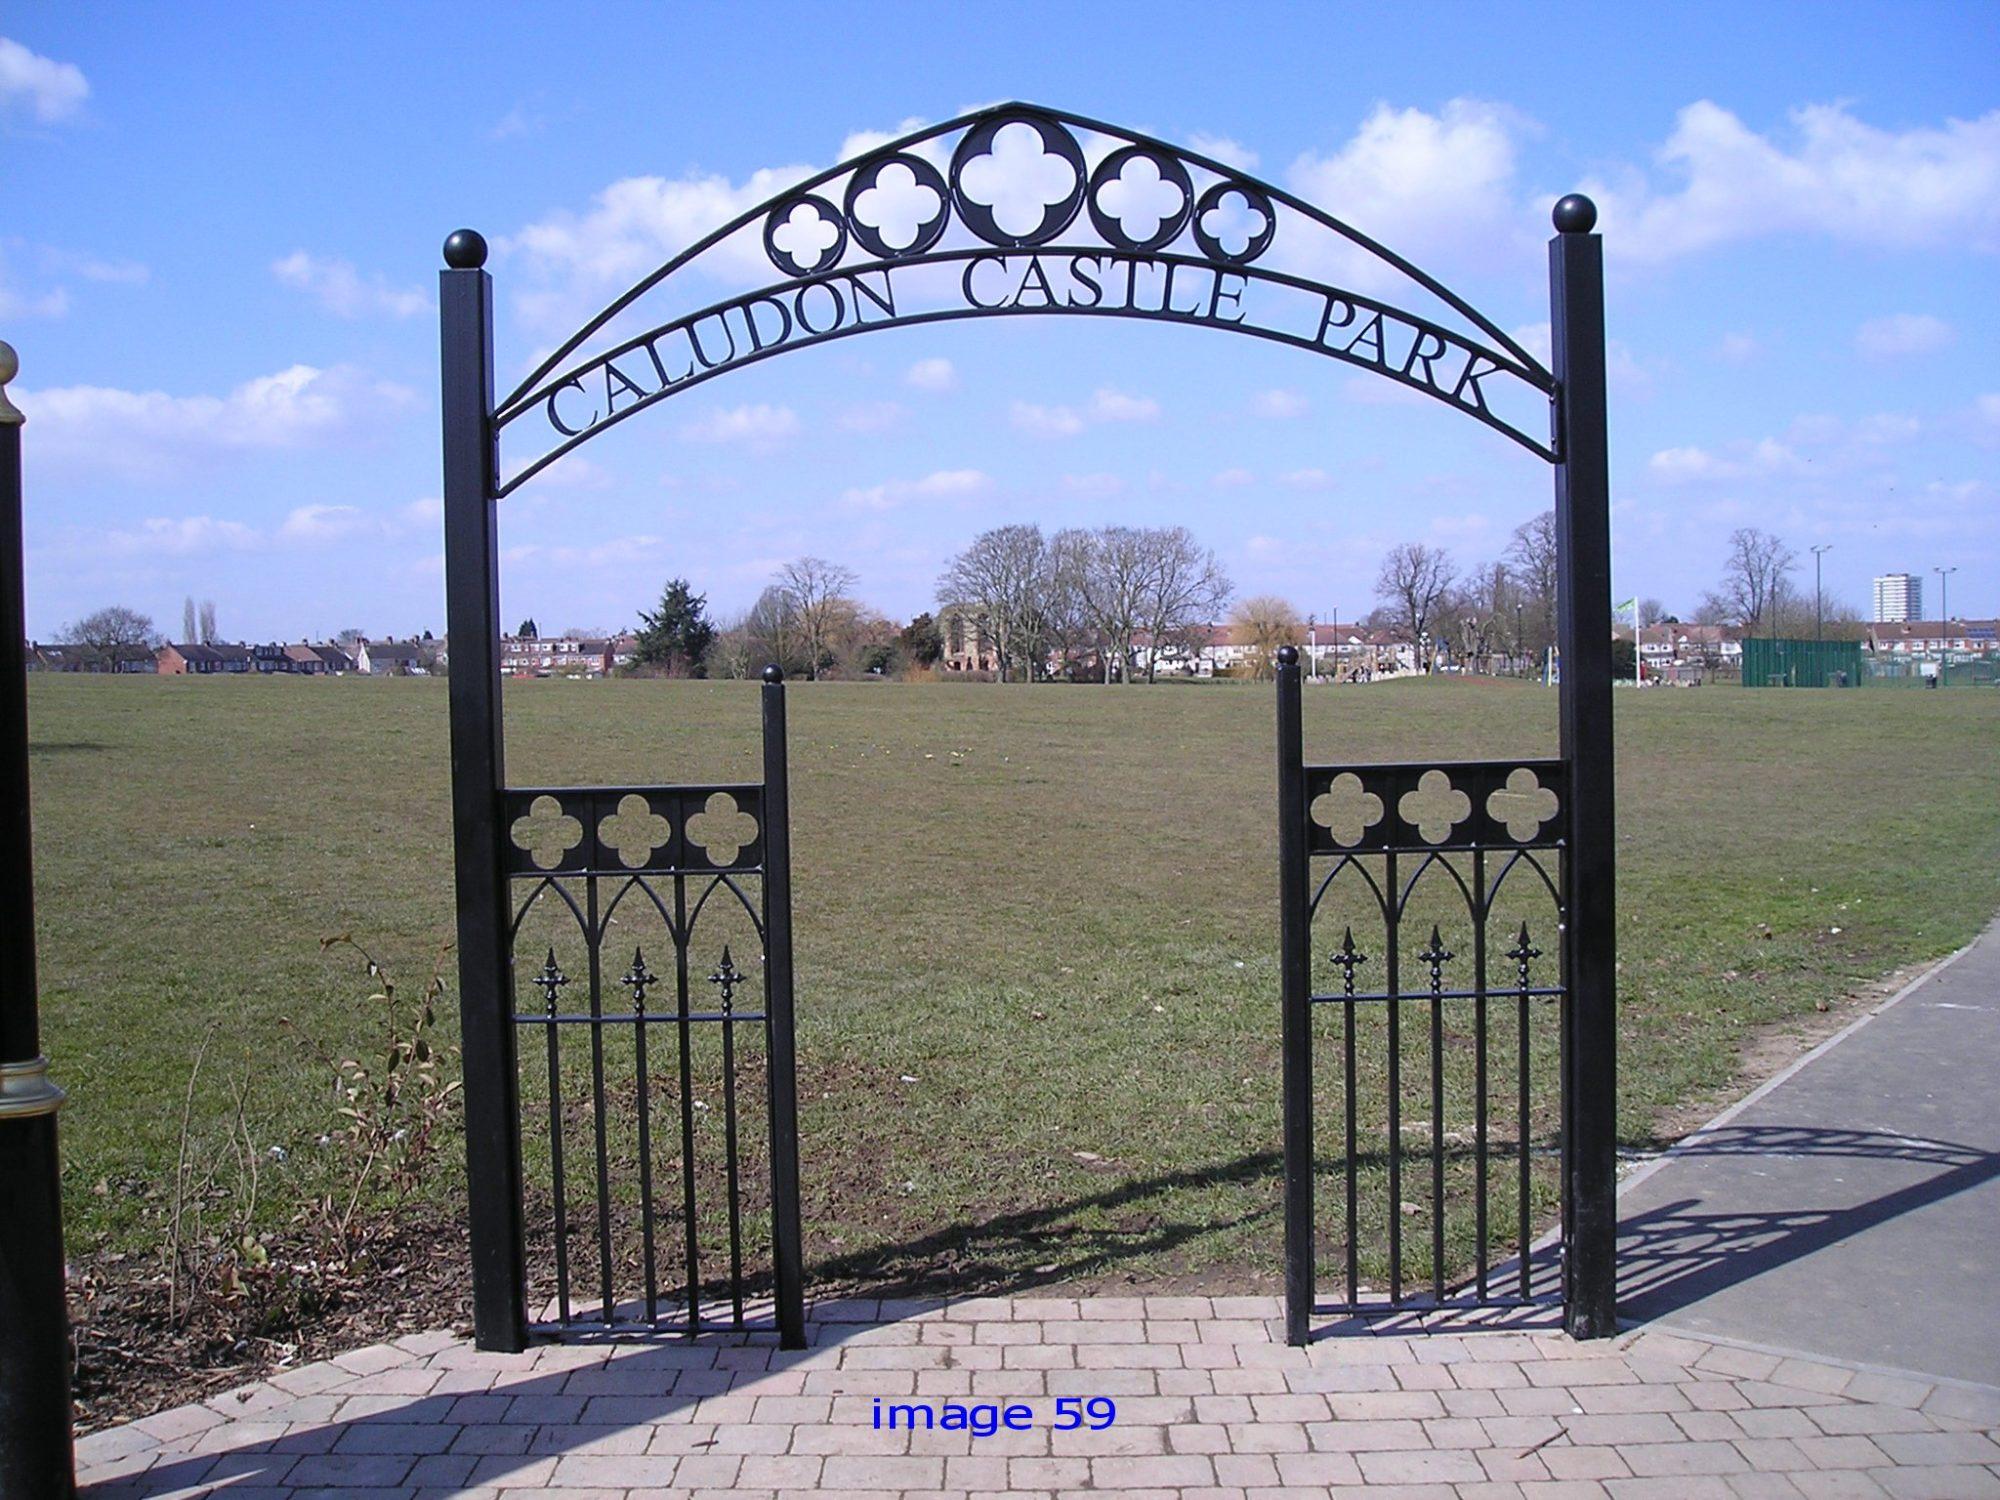 Decorative metal archway